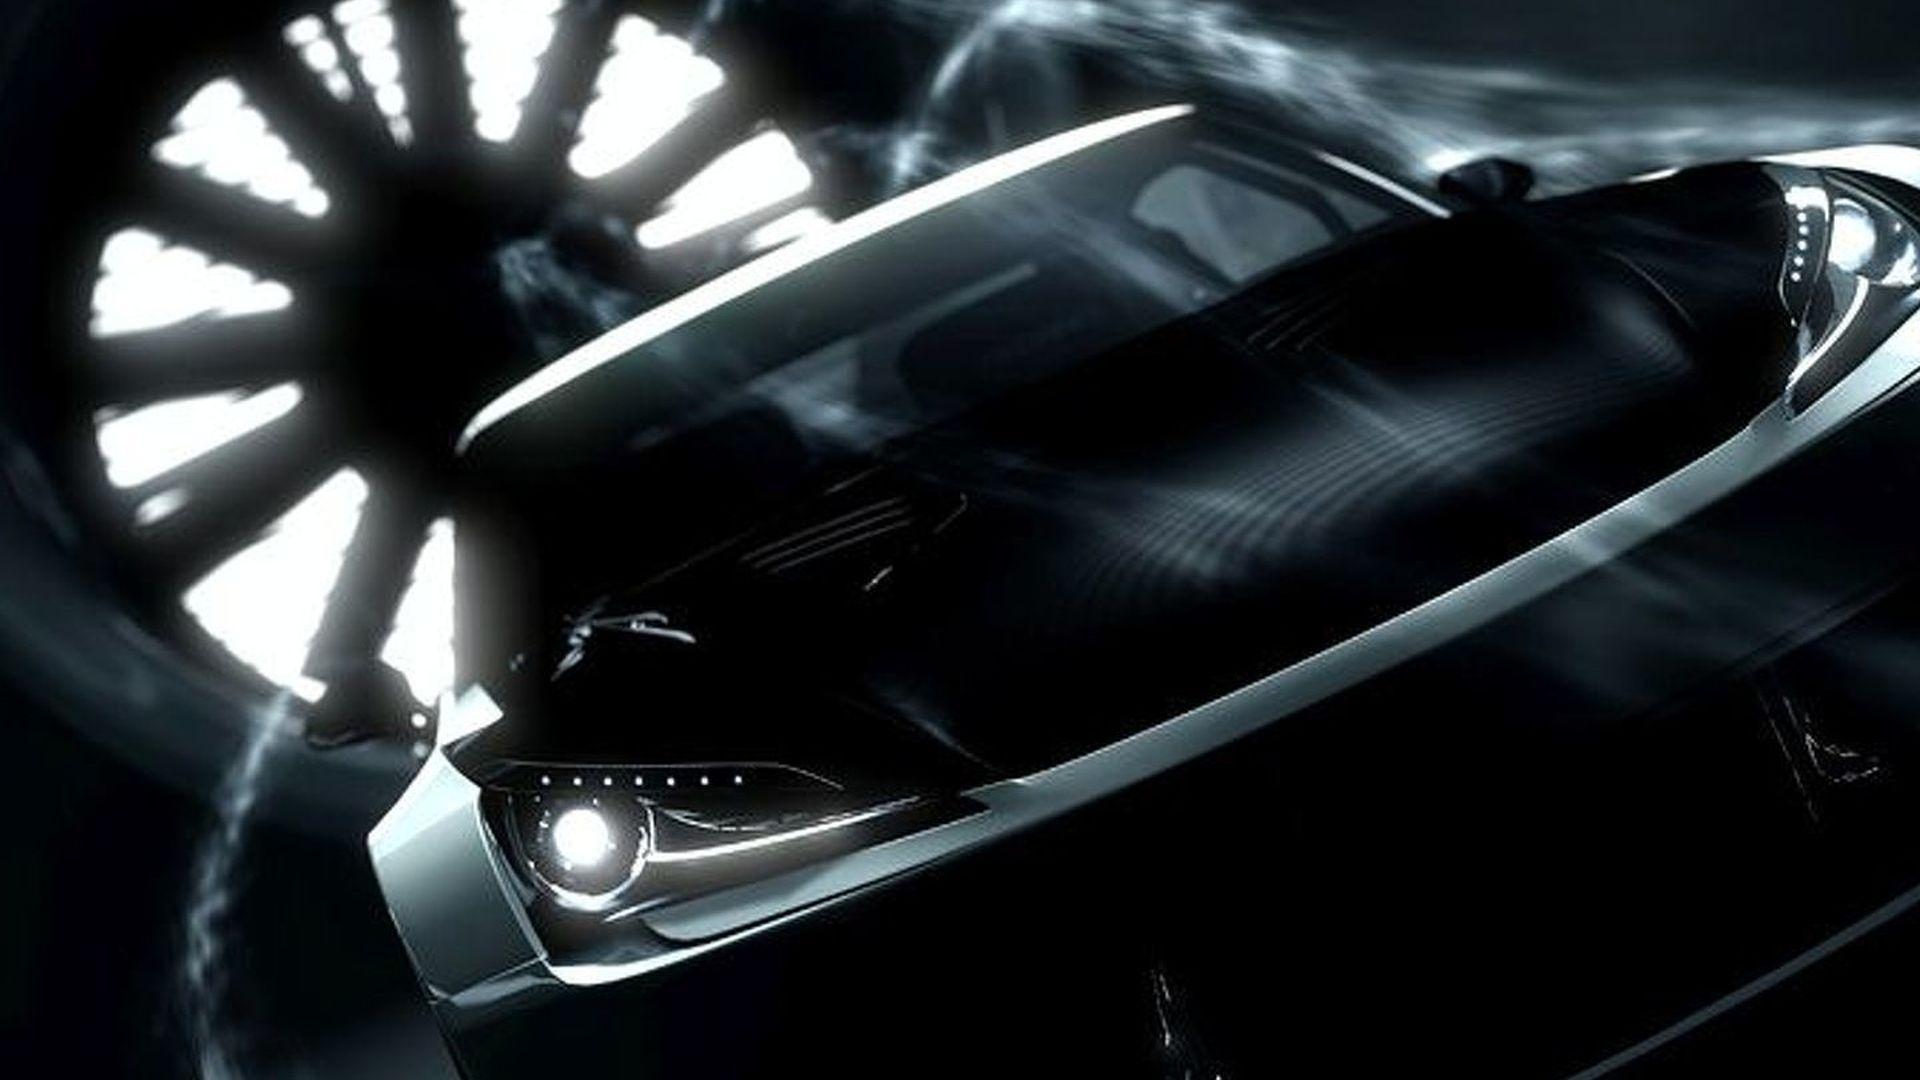 Toyota FT-86 G Sports Concept Revealed at Tokyo Auto Salon - Gran Turismo 5 Trailer [Video]